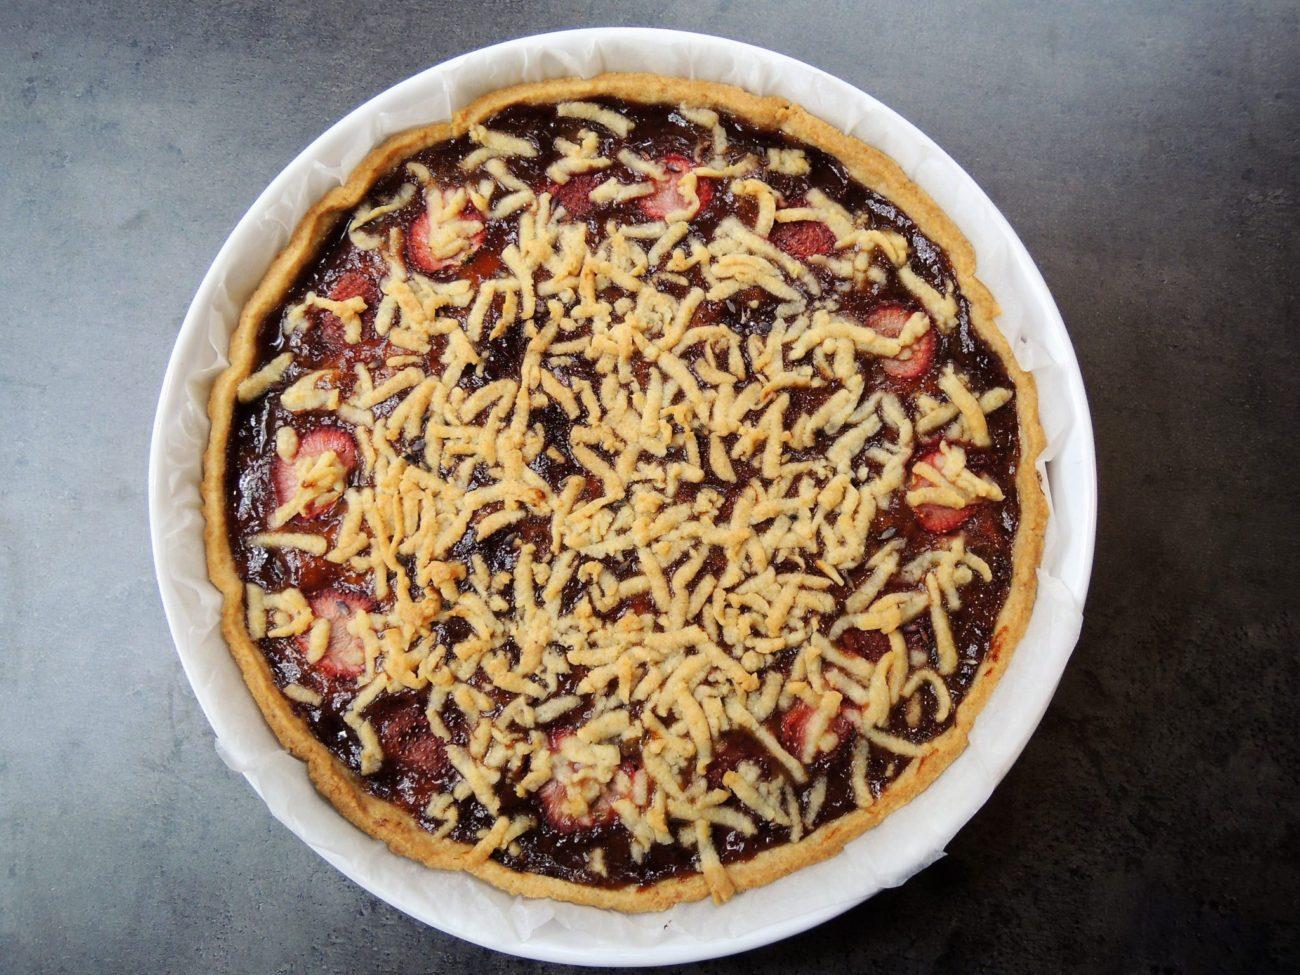 Linecký koláč s jahodovou marmeládou a levandulí